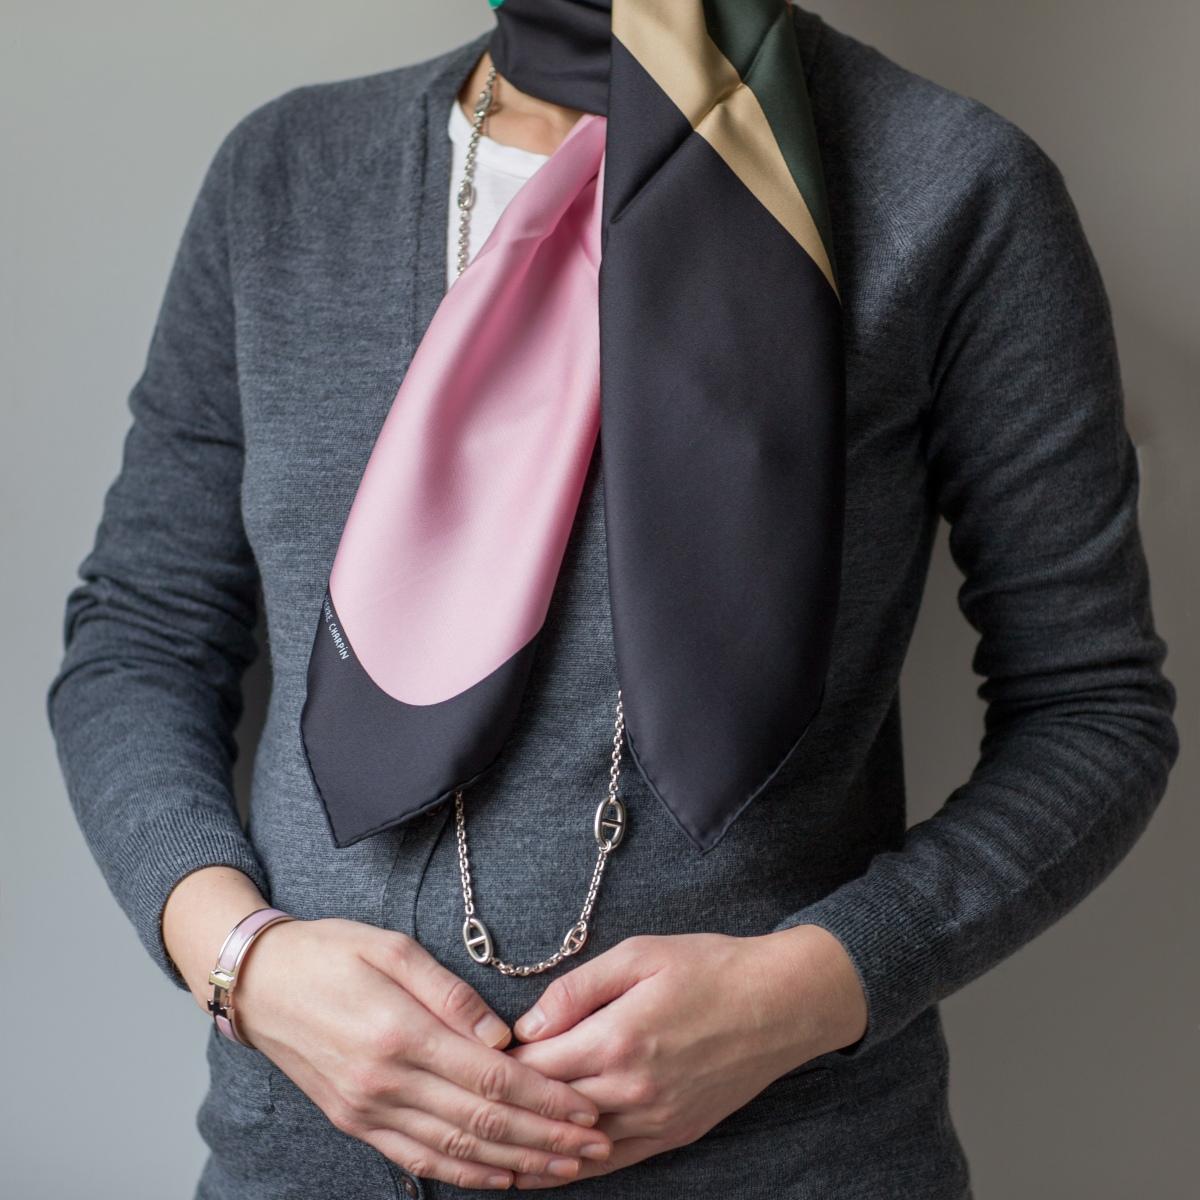 La Serpentine de Pierre Charpin, Pierre Charpin, Hermes scarf, carre, Farandole, necklace, knot, knotting, tutorial, hermes carre, Hermes Schal, эрмес, платок, карре, как красиво завязать платок, how to wear a scarf